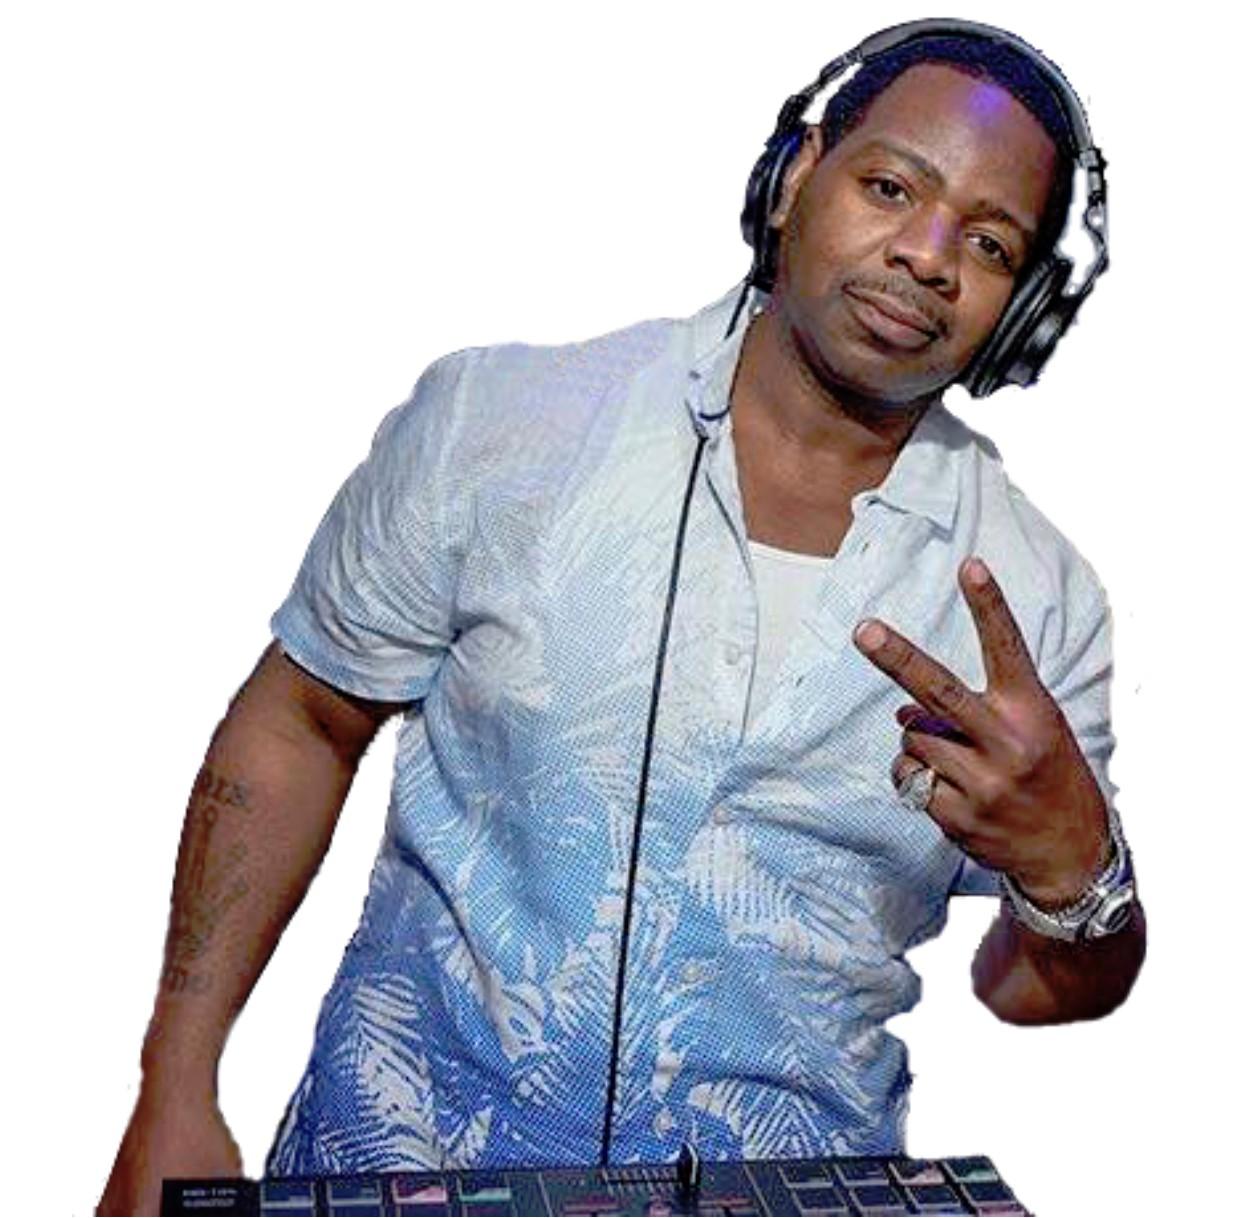 The Legendary DJ Ron G